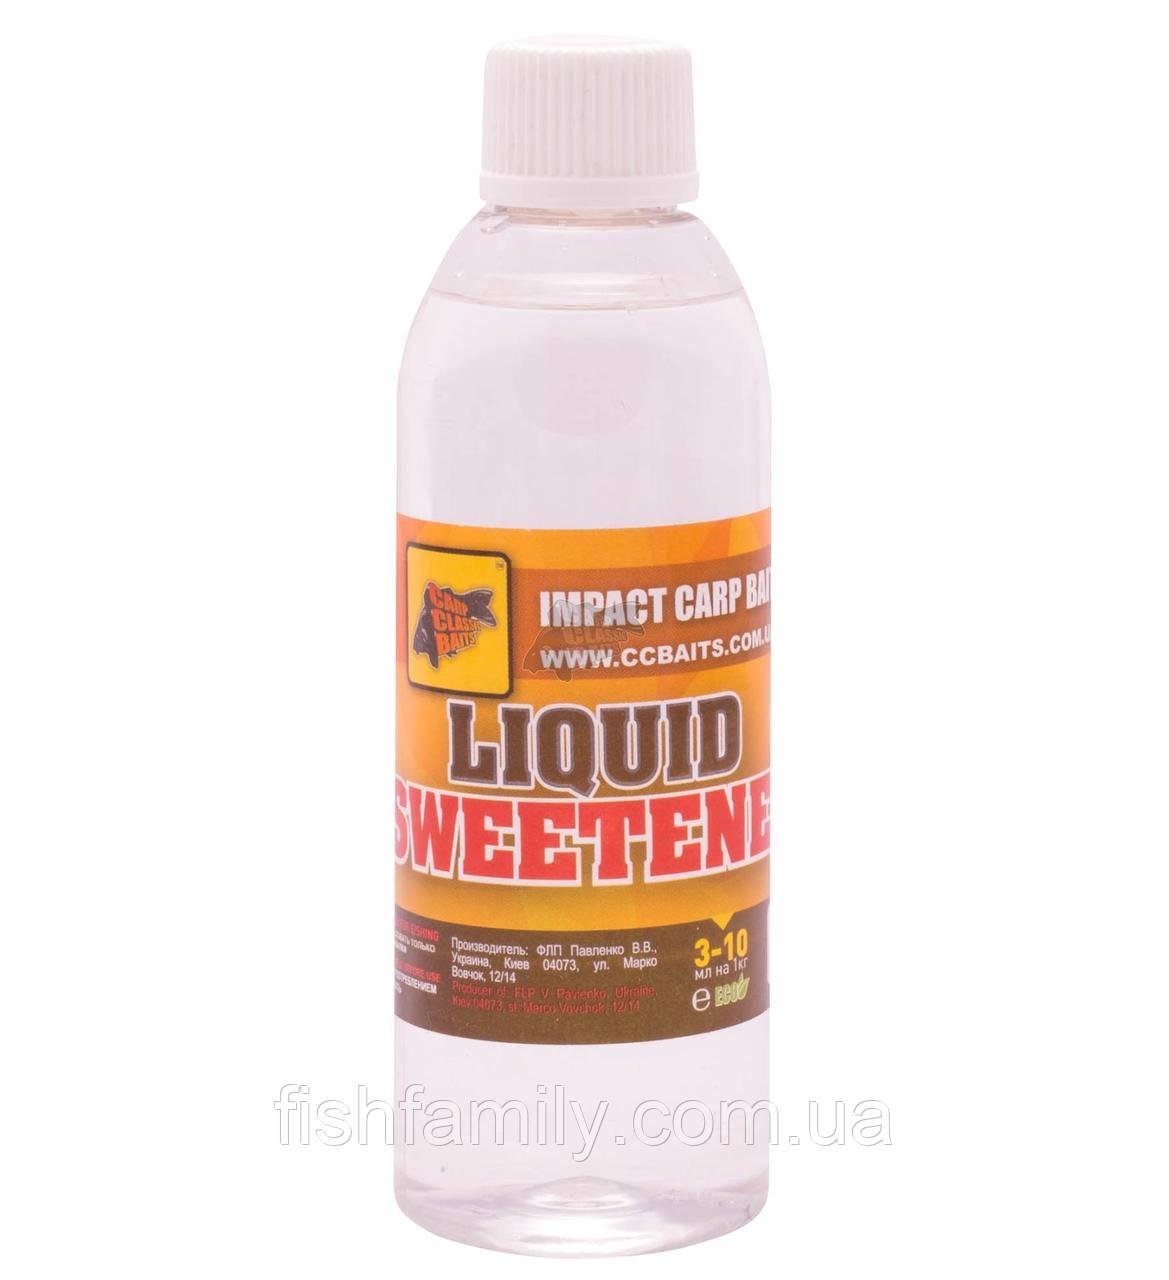 Подсластитель Liquid Sweetener, 100